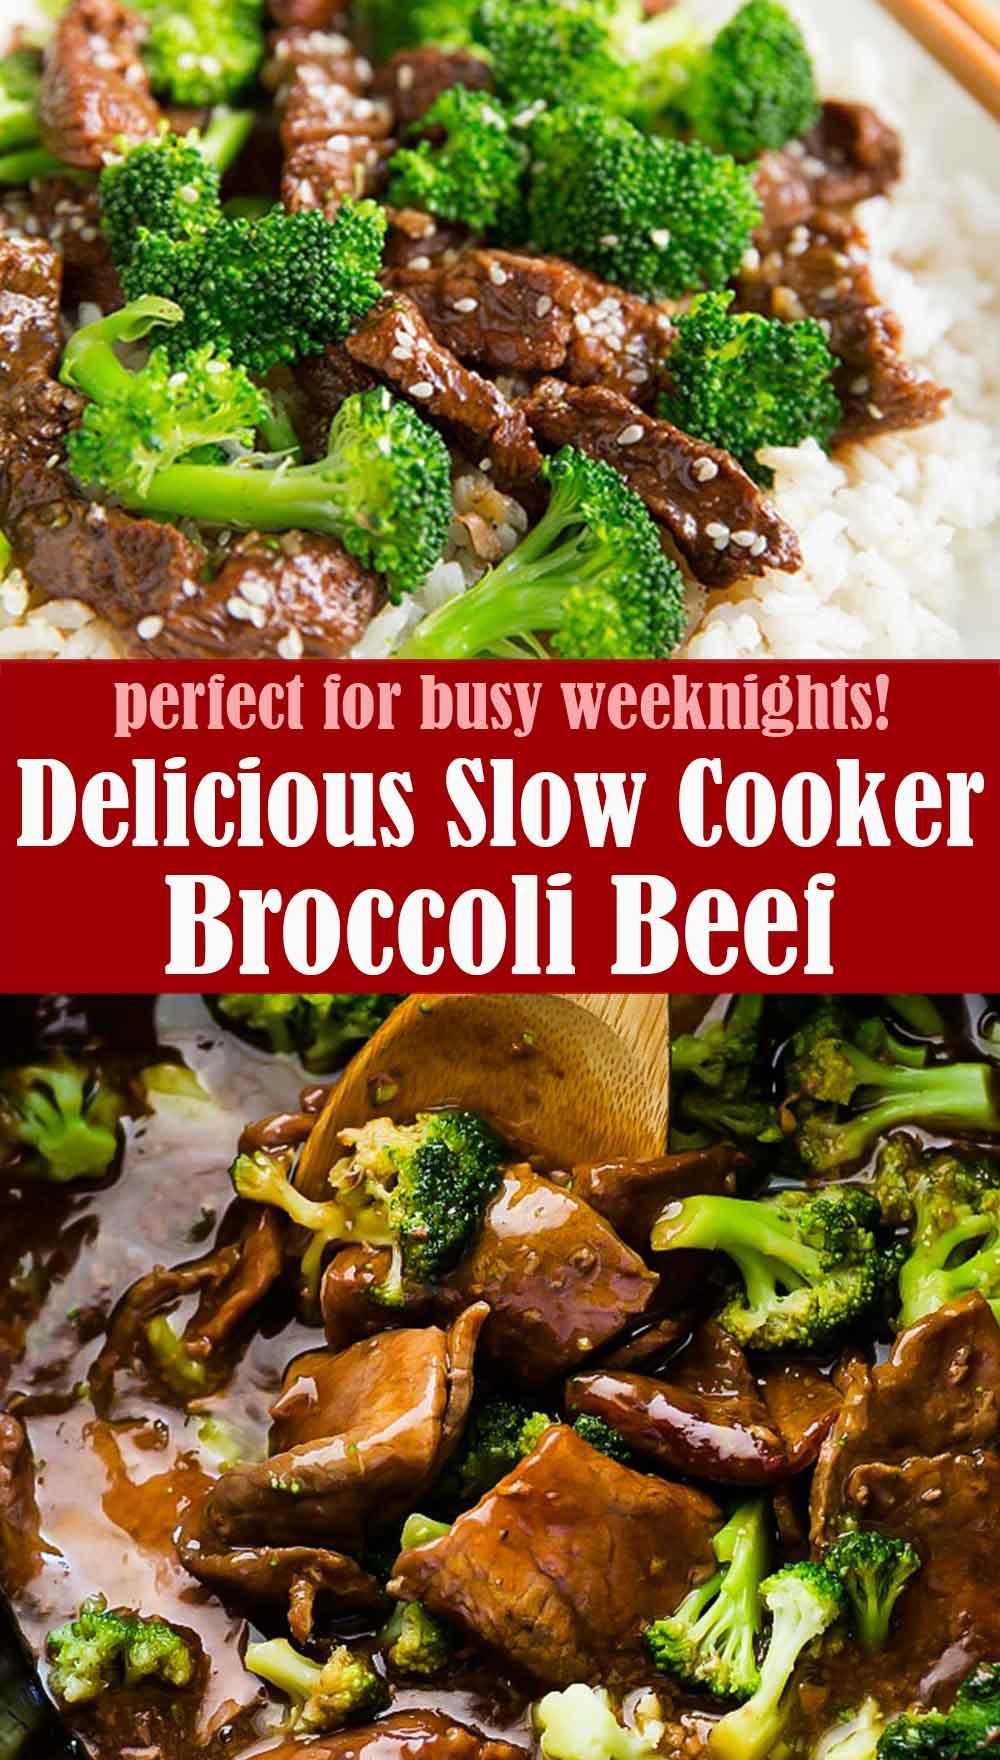 Delicious Slow Cooker Broccoli Beef